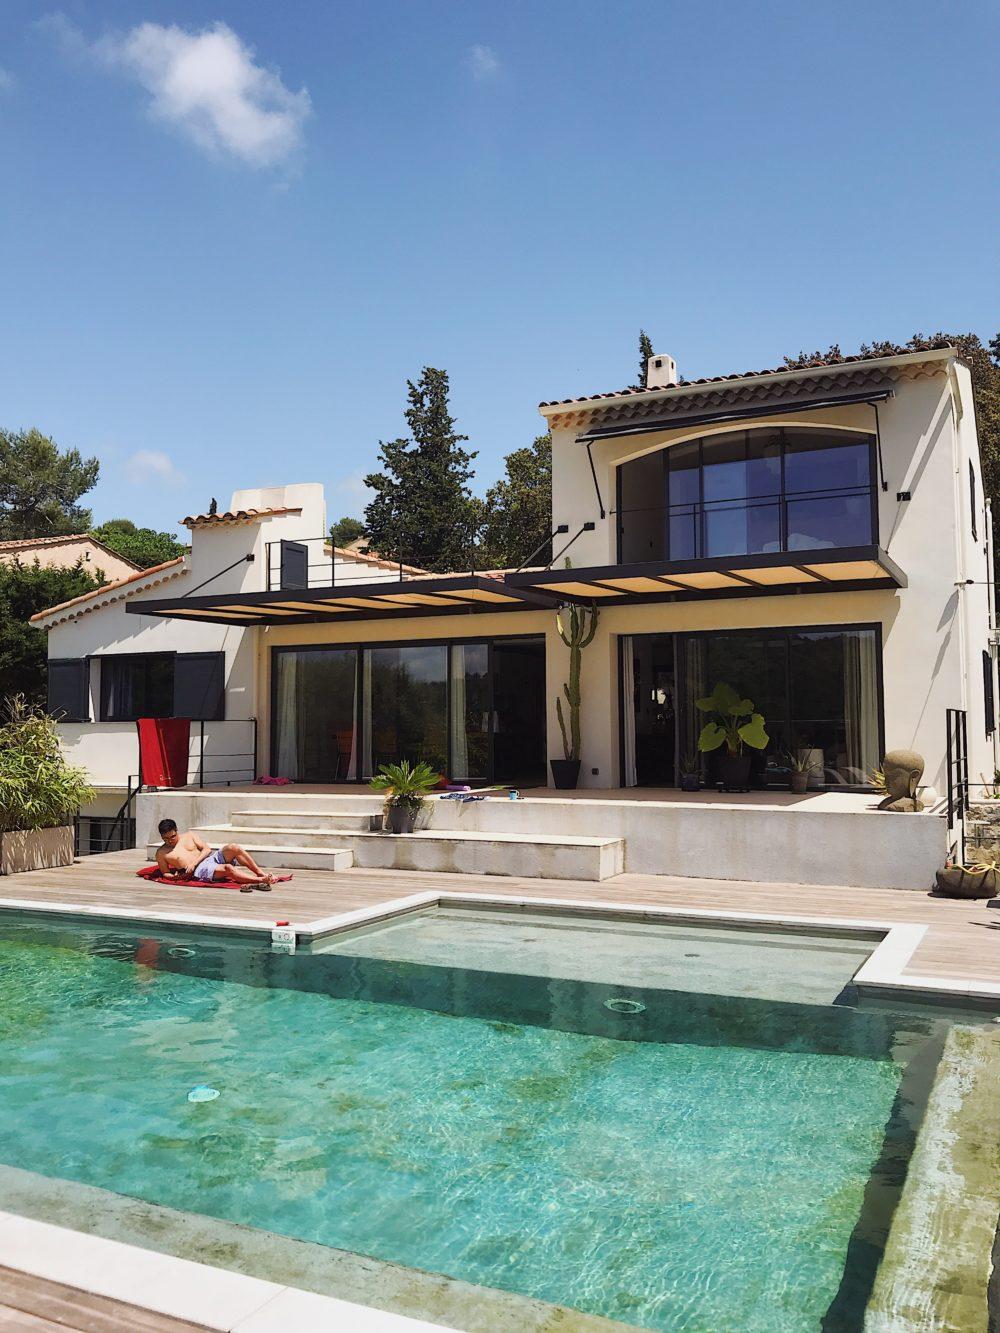 Biot-Airbnb-France-e1530895702357.jpg